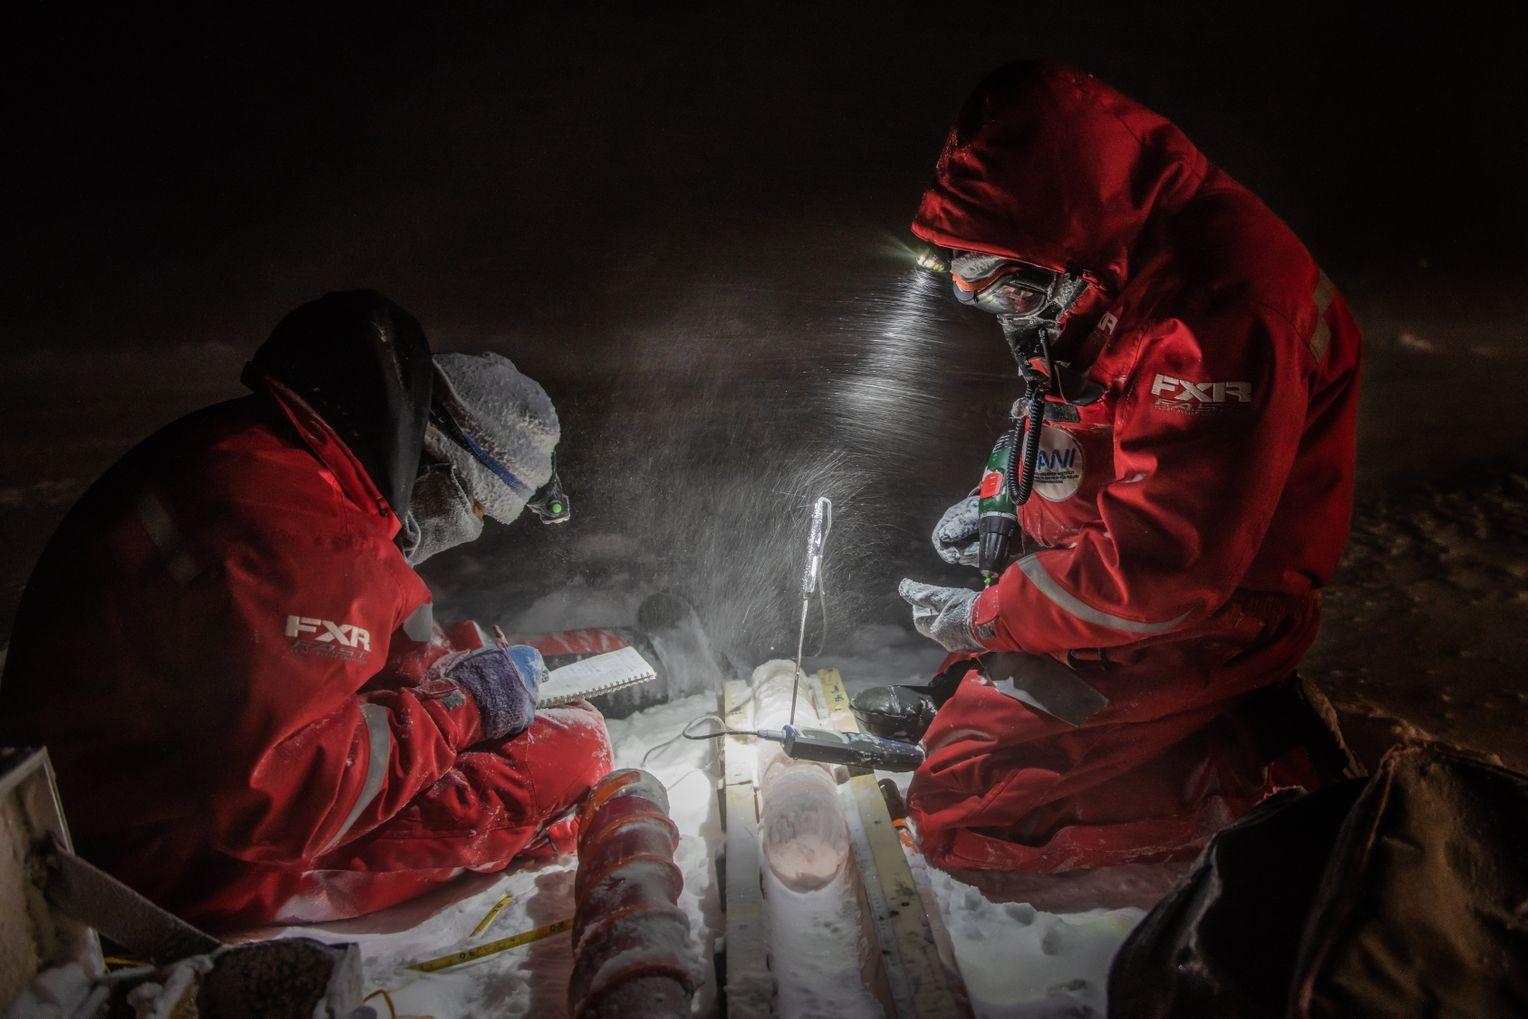 LLei Wang und Michael Angelopolous bei Temperaturmessungen an einem Eiskern. Das Wetter ist stürmisch. Foto:Esther Horvath